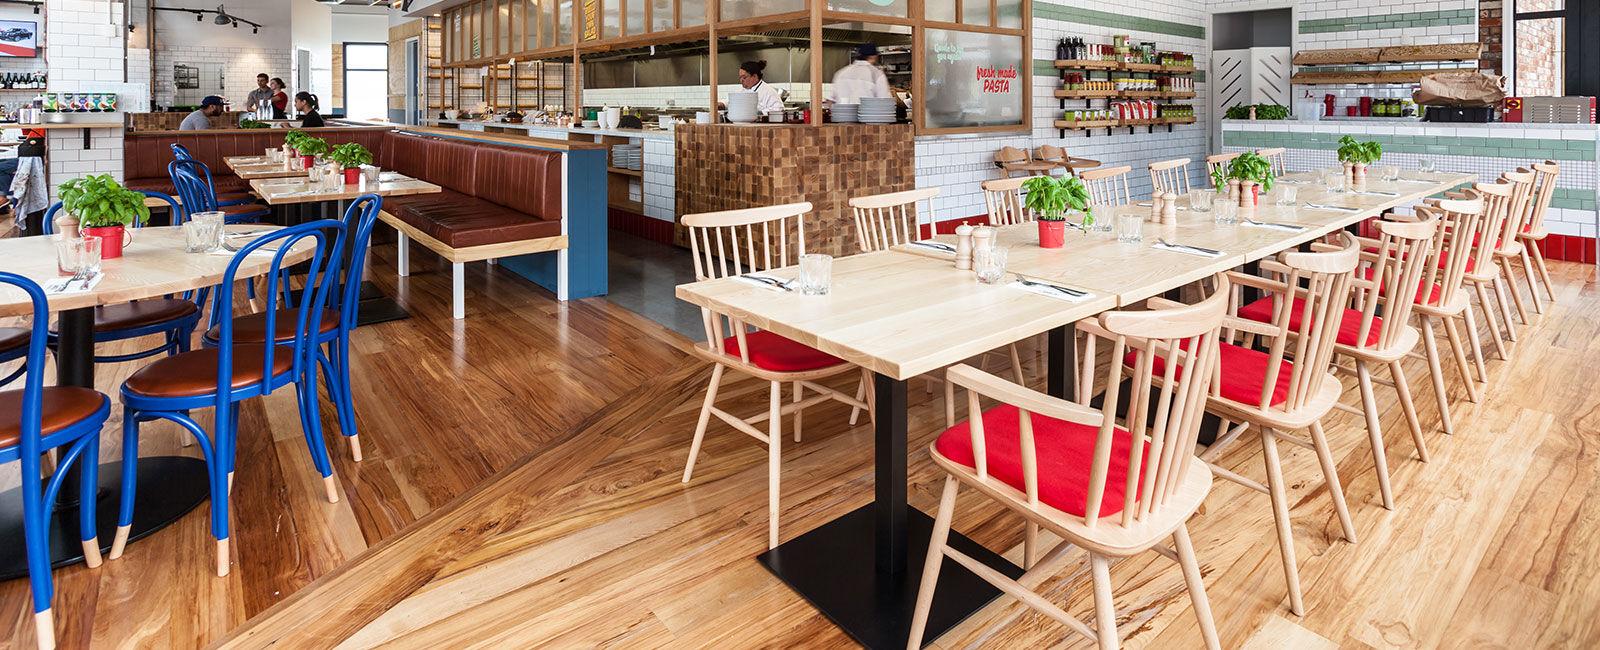 Goode Brothers New Lynn Restaurant Bar Franchise Furniture